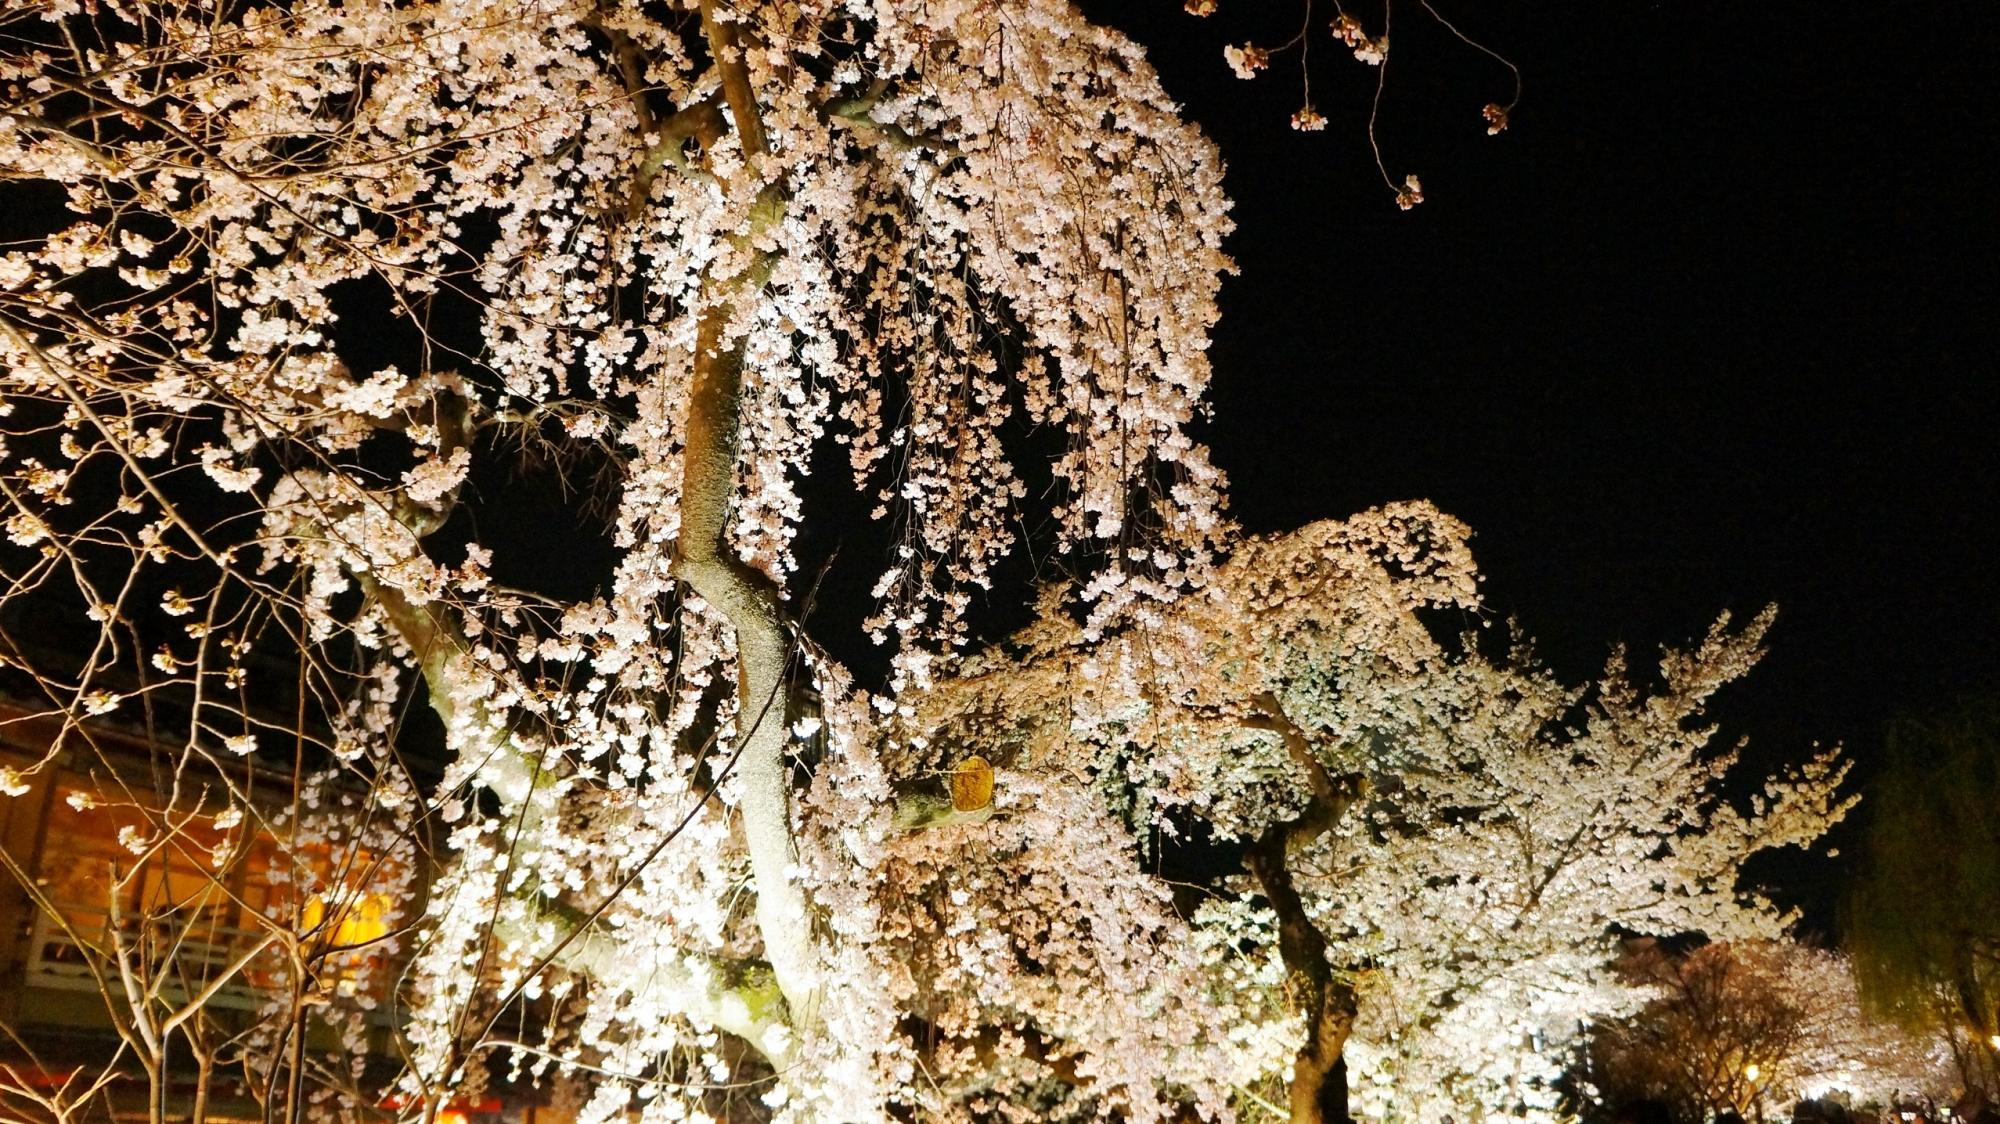 Kyoto Gion Shirakawa weeping cherry tree light up spring